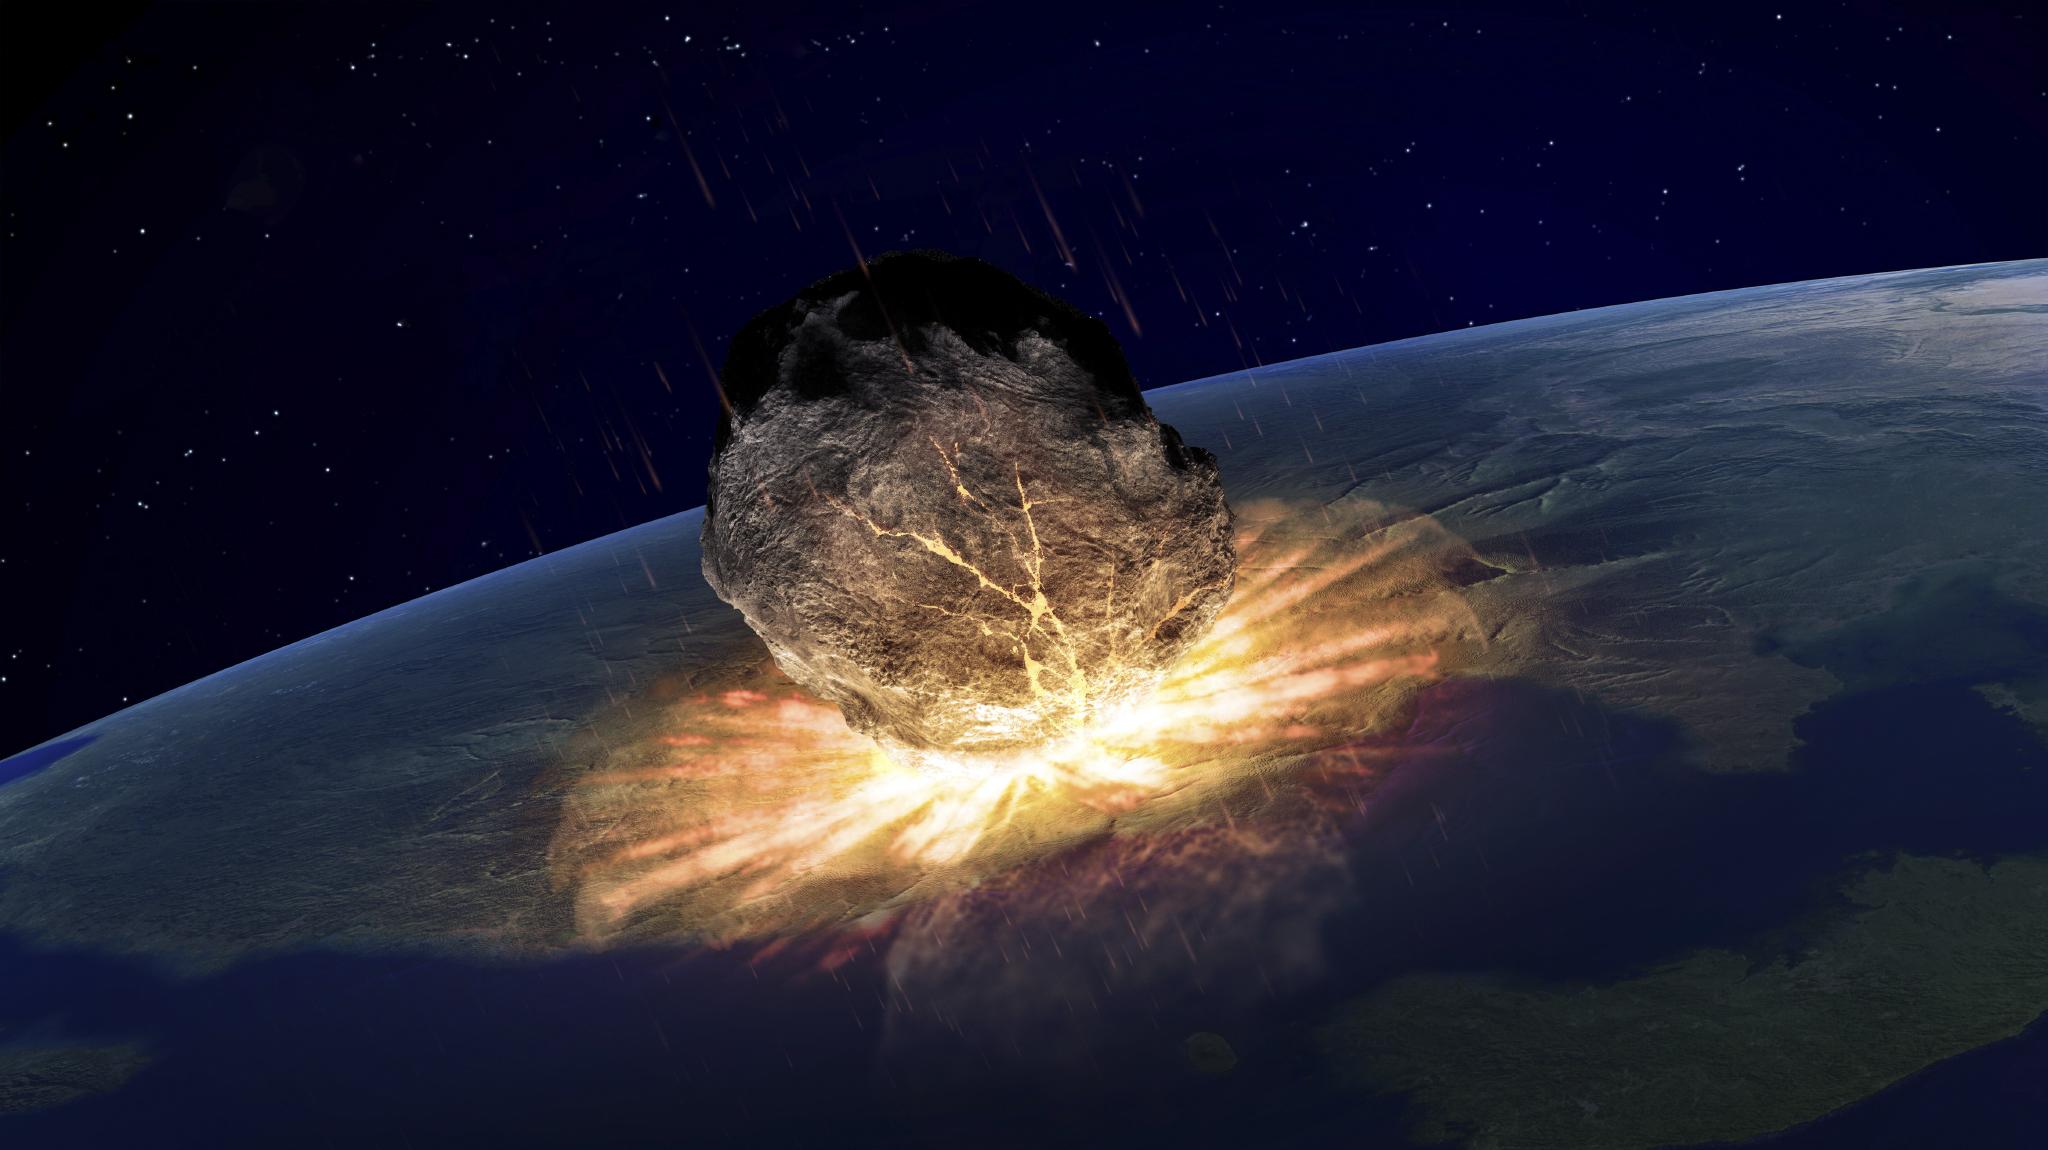 Asteroid hitting earth, artwork